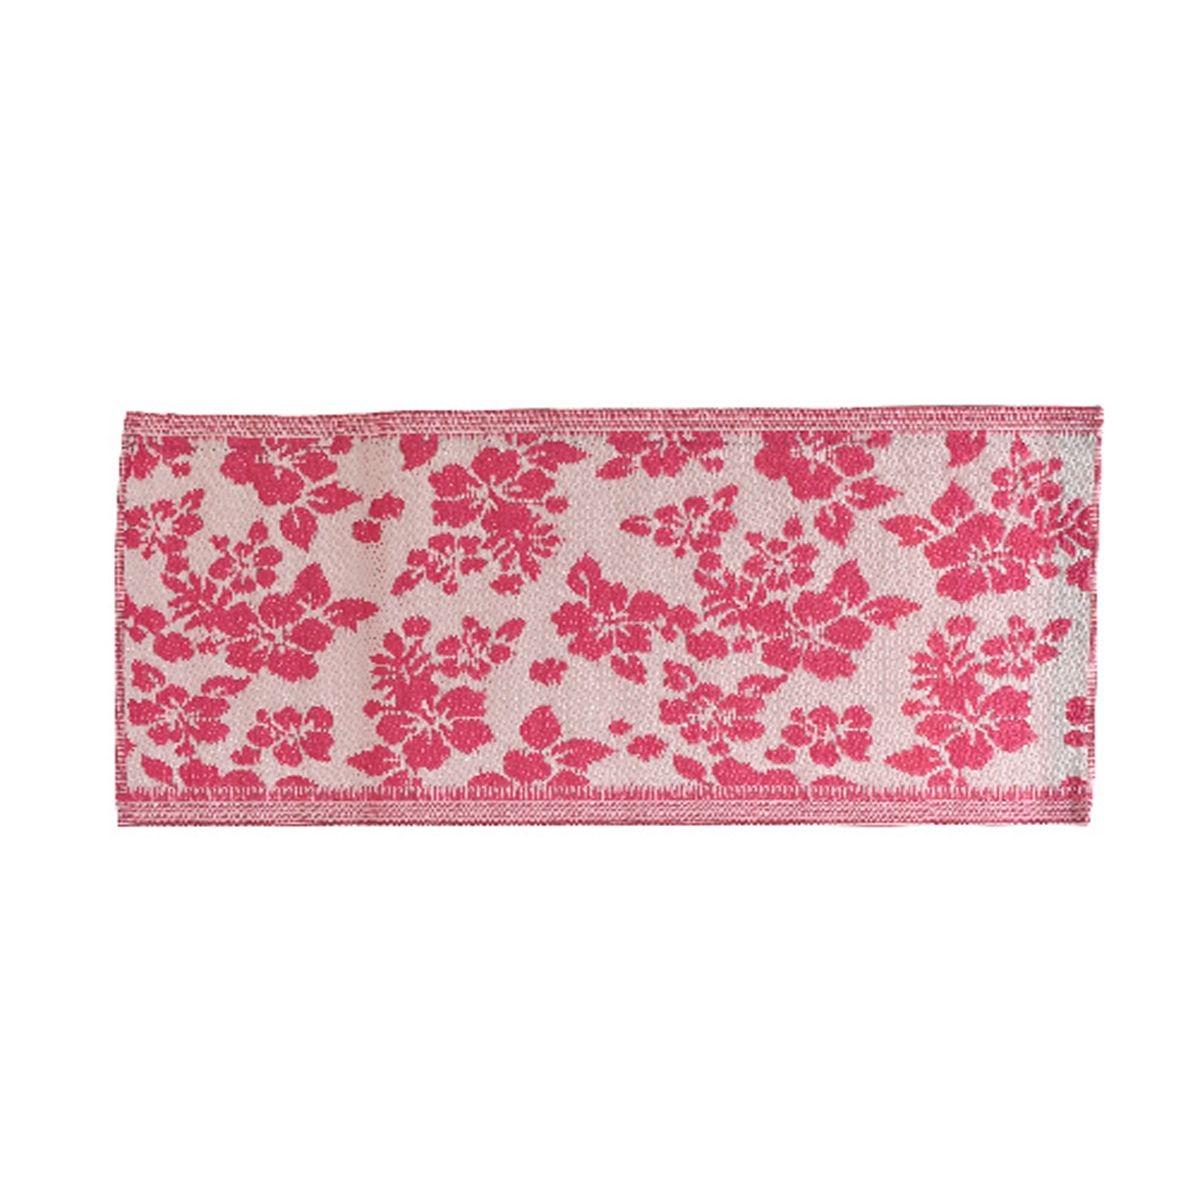 Tapis rectangulaire en polypropylène 140 x 70 cm motifs fleurs Rose - Jardideco